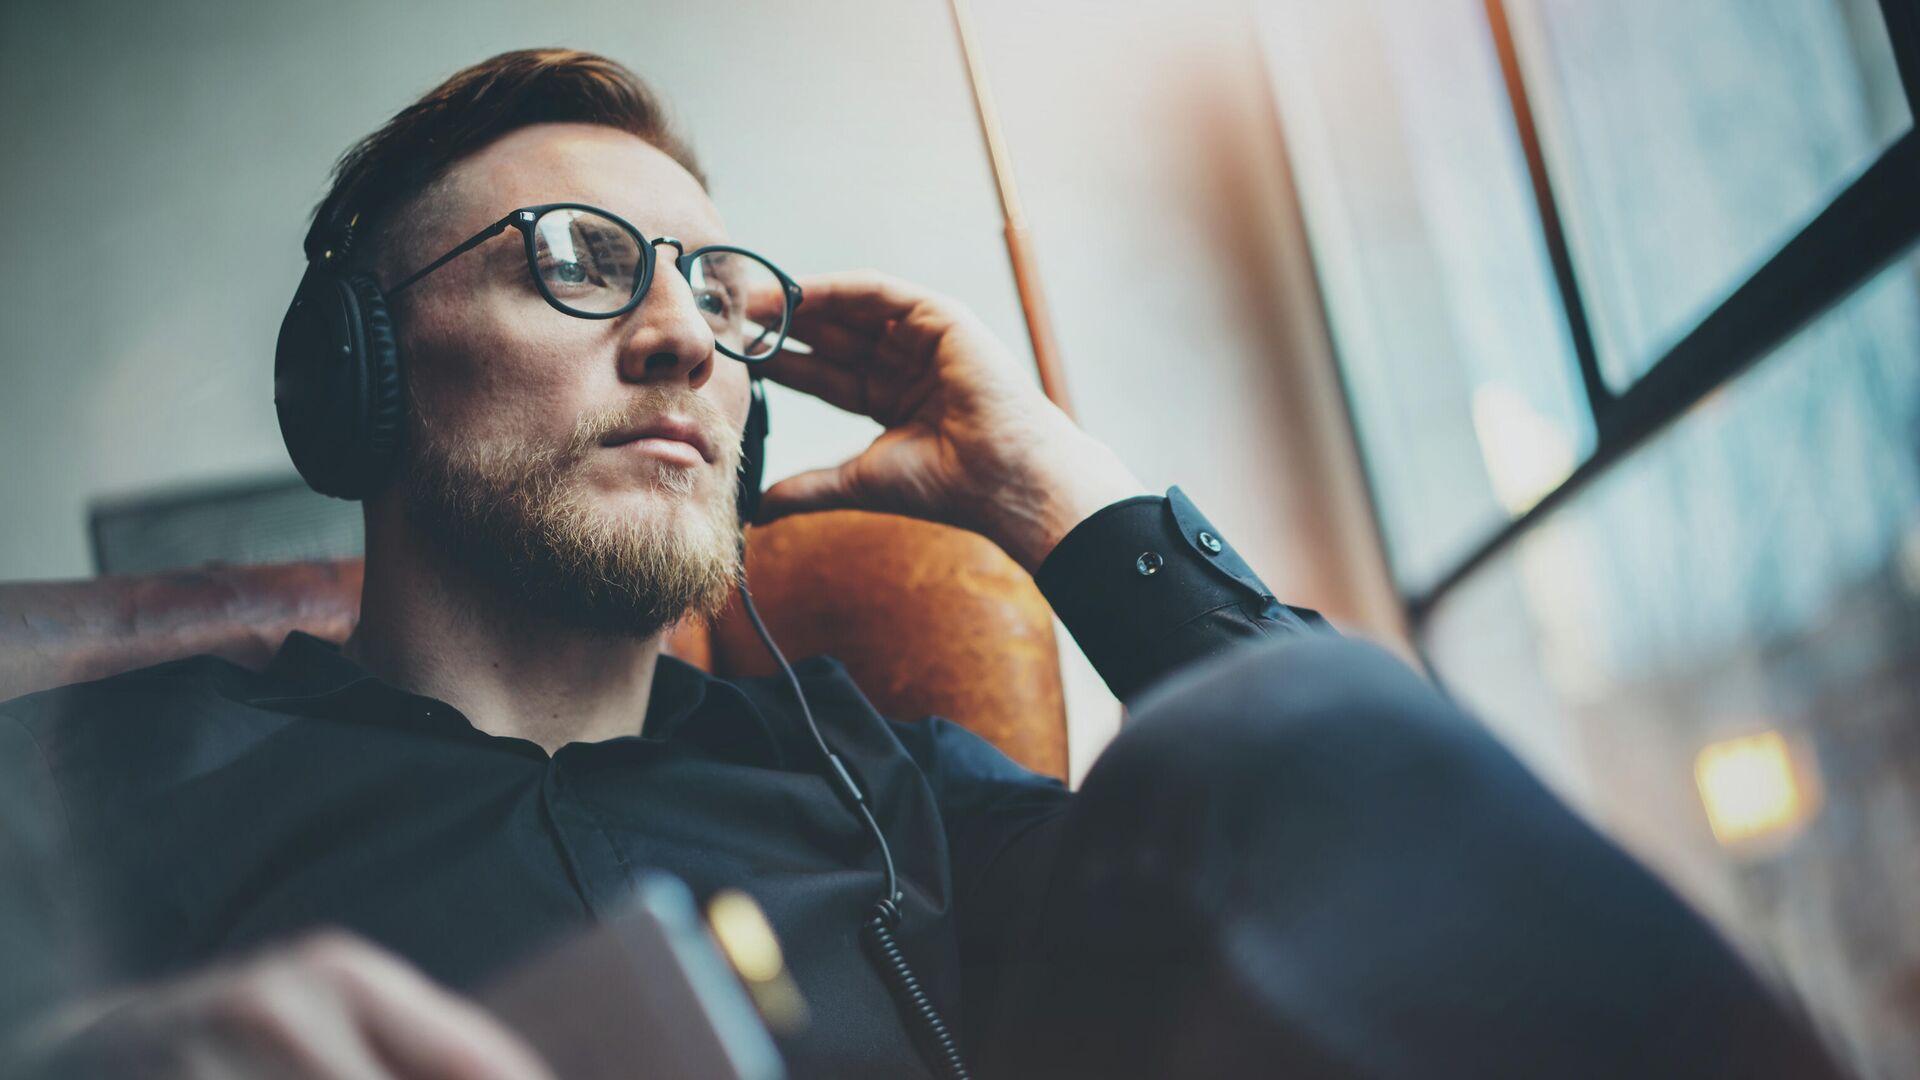 Мужчина слушает музыку - РИА Новости, 1920, 26.08.2020